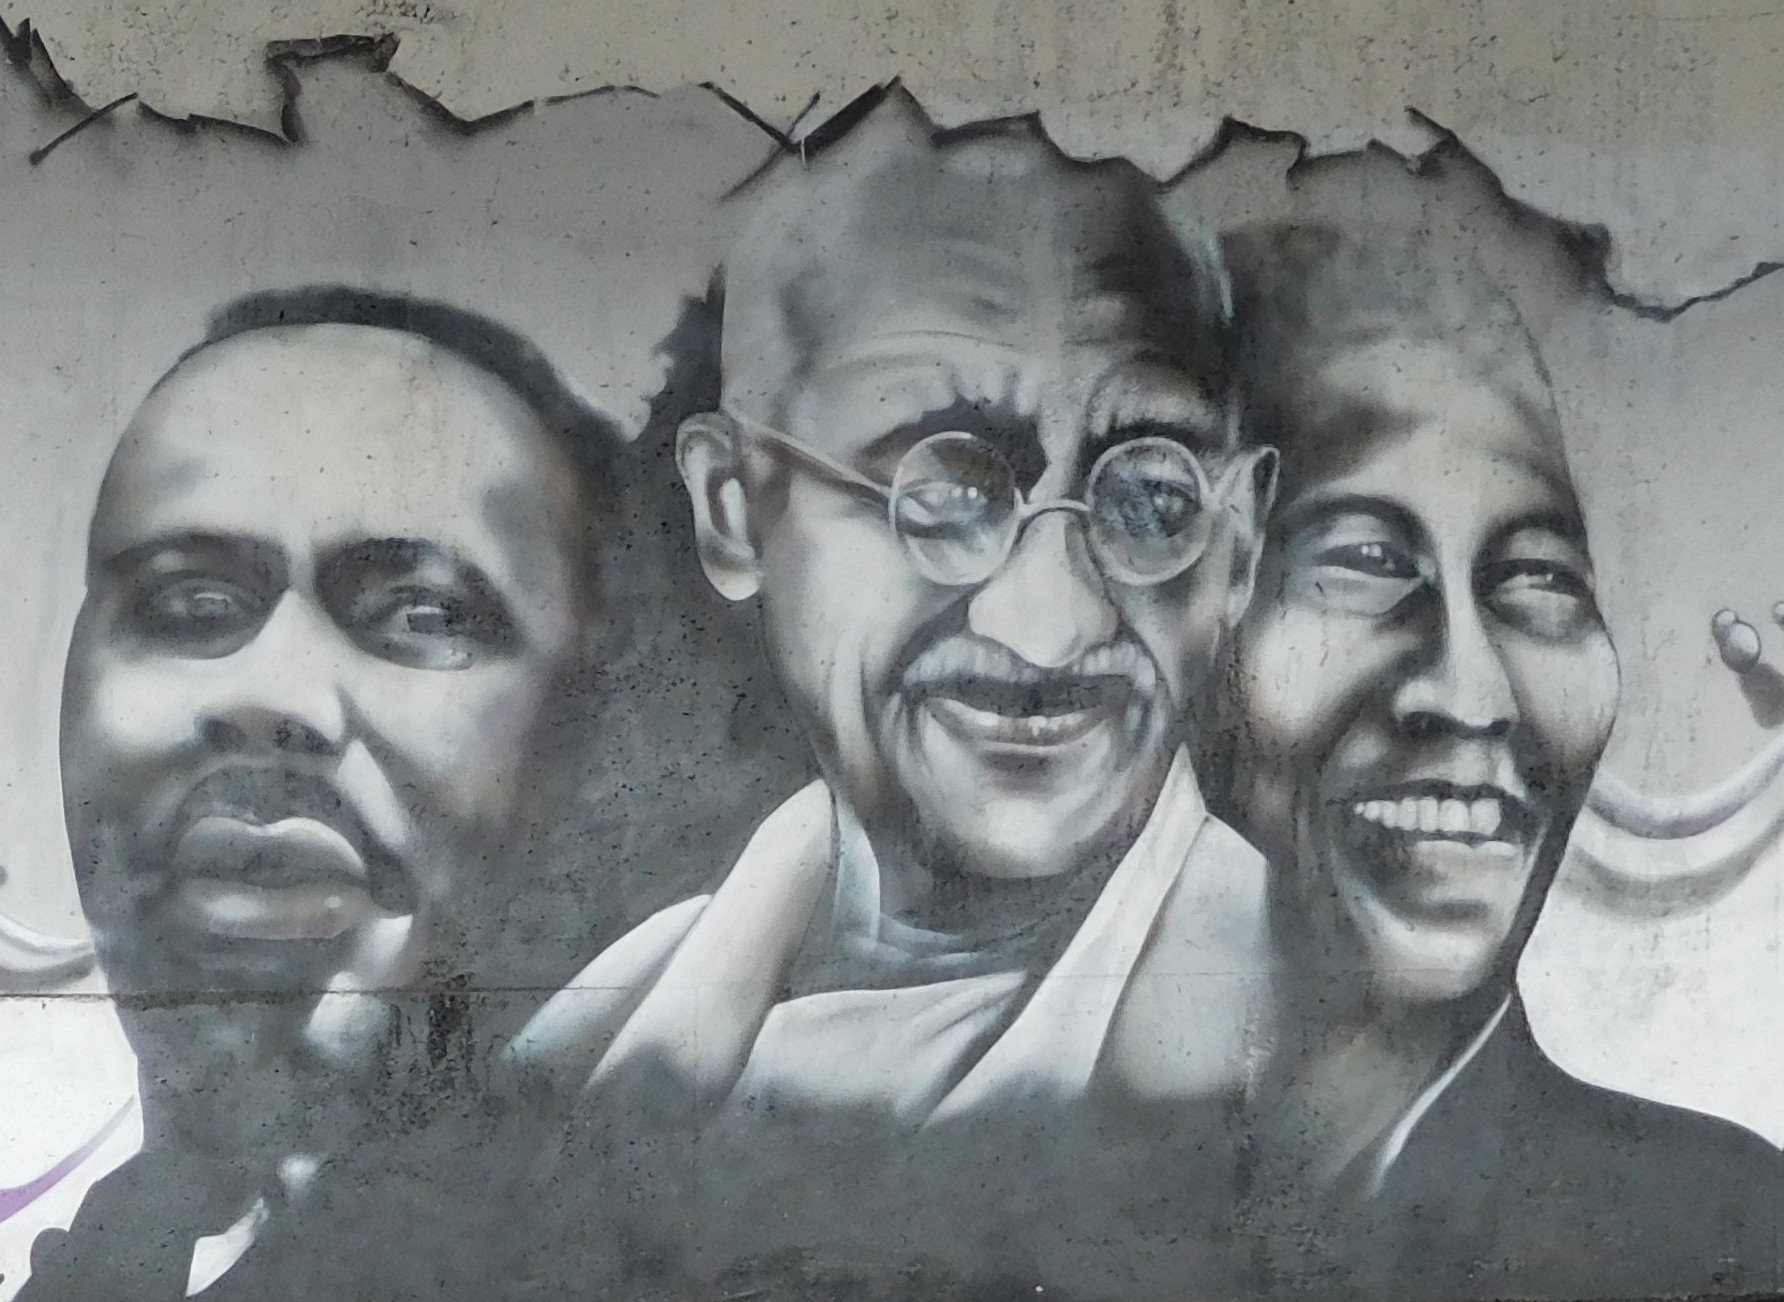 graffiti_by_e2c_young_people_-_martin_luther_king2c_jr-2c_mohandas_k-_gandhi2c_nelson_mandela